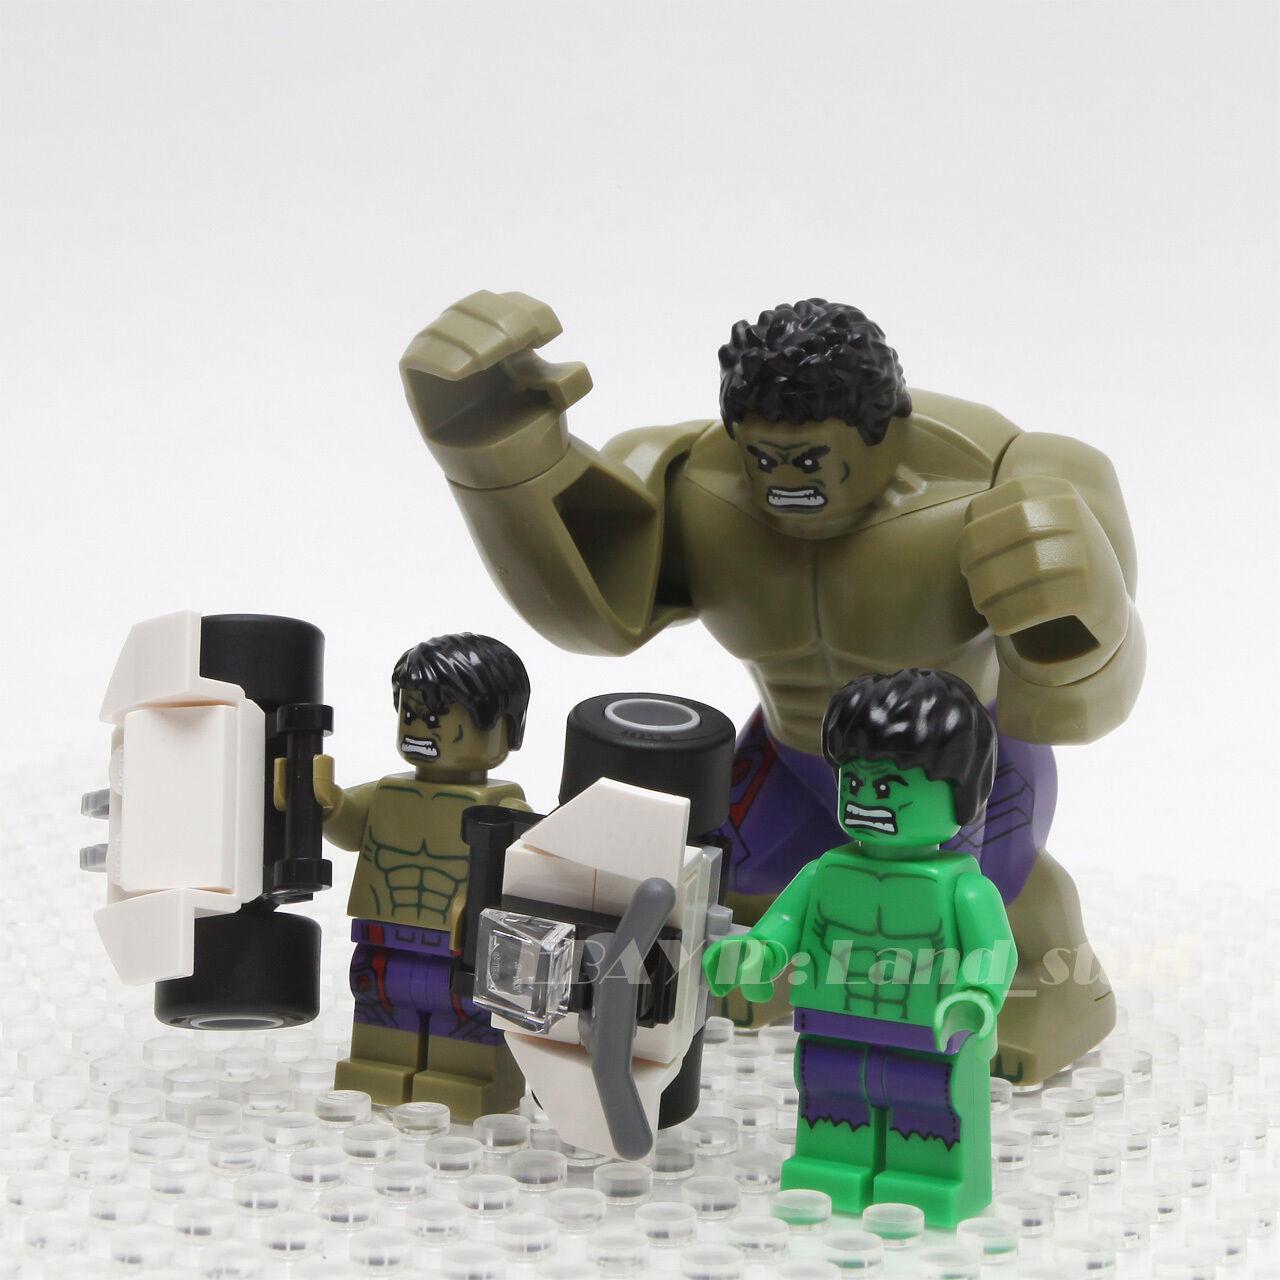 LEGO förundras Super Heroes Avengers, HULK Minifigurer 500022 503084 76031